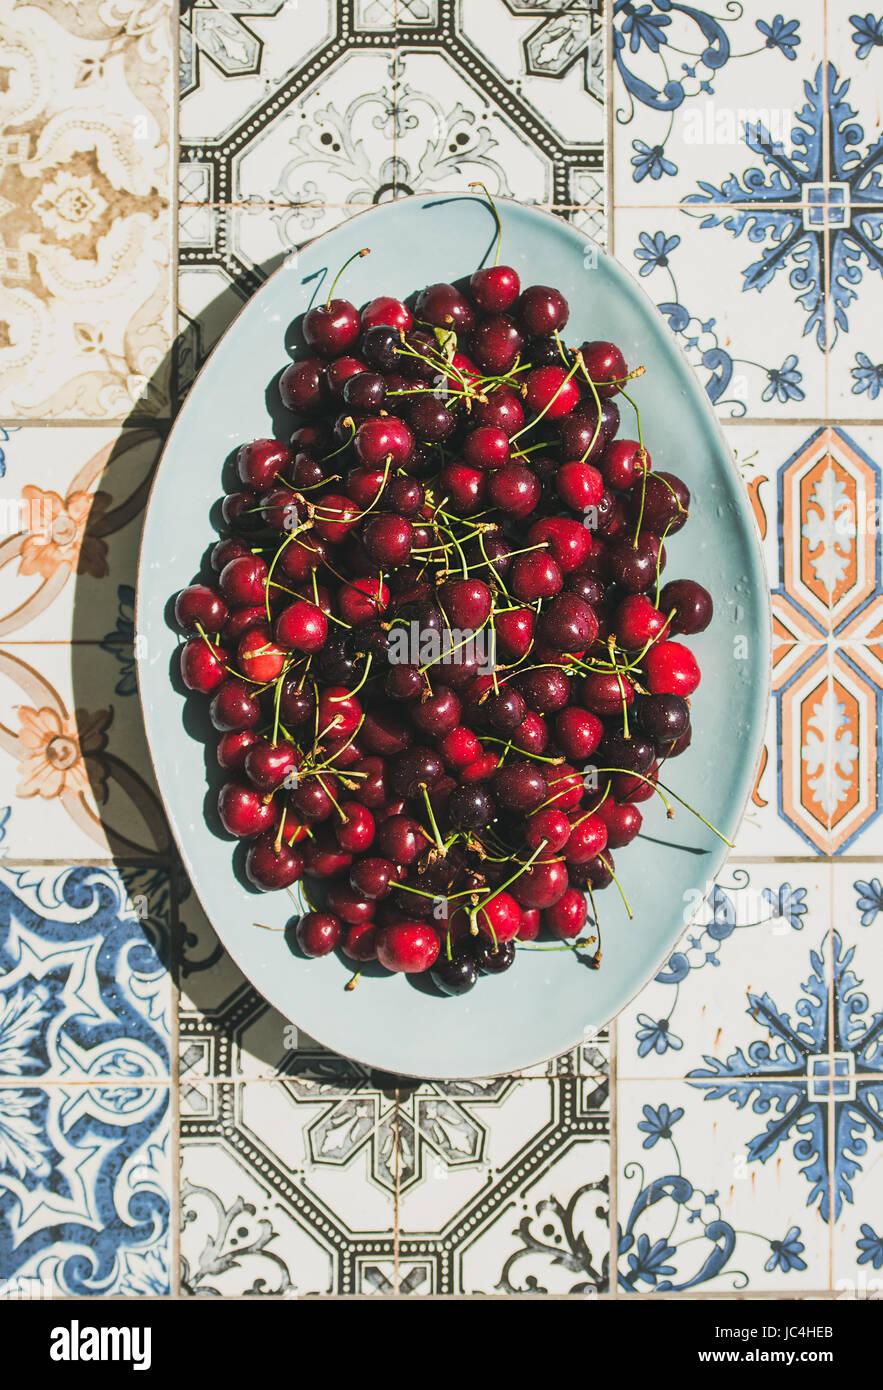 Fresh sweet cherries over oriental ceramic tiles background, top view - Stock Image